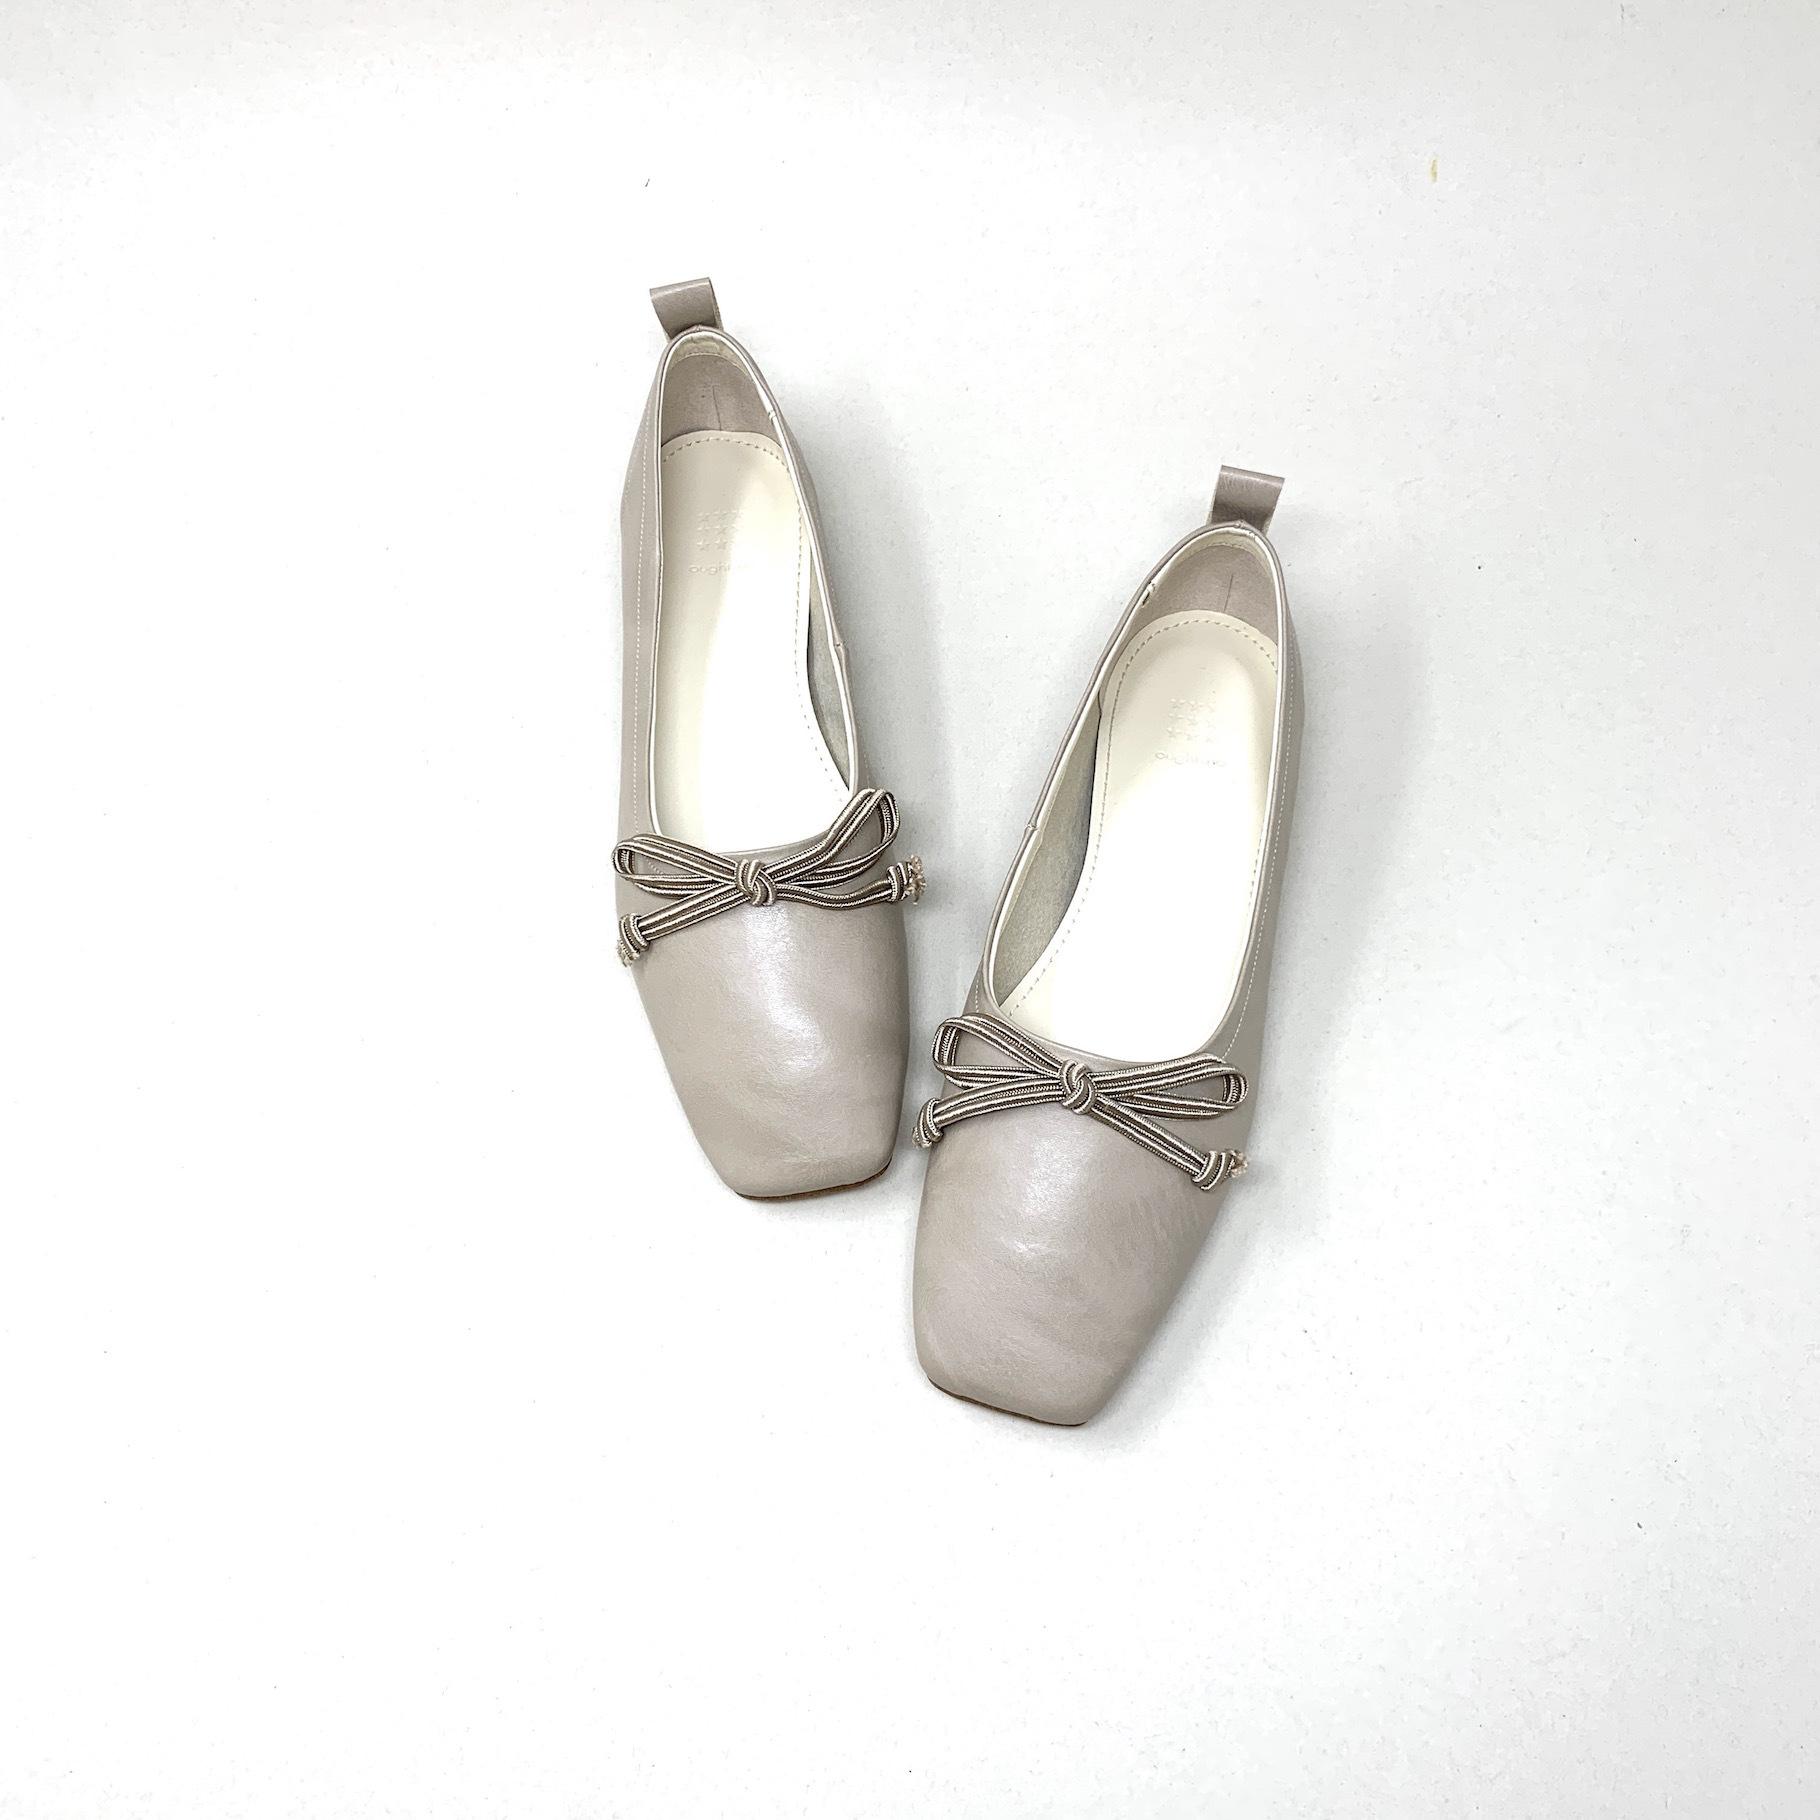 Code Ribbon flat Ballet|コードリボンフラットバレエ_#ot81353s|【Ought=na】|madeinjapan|日本製|